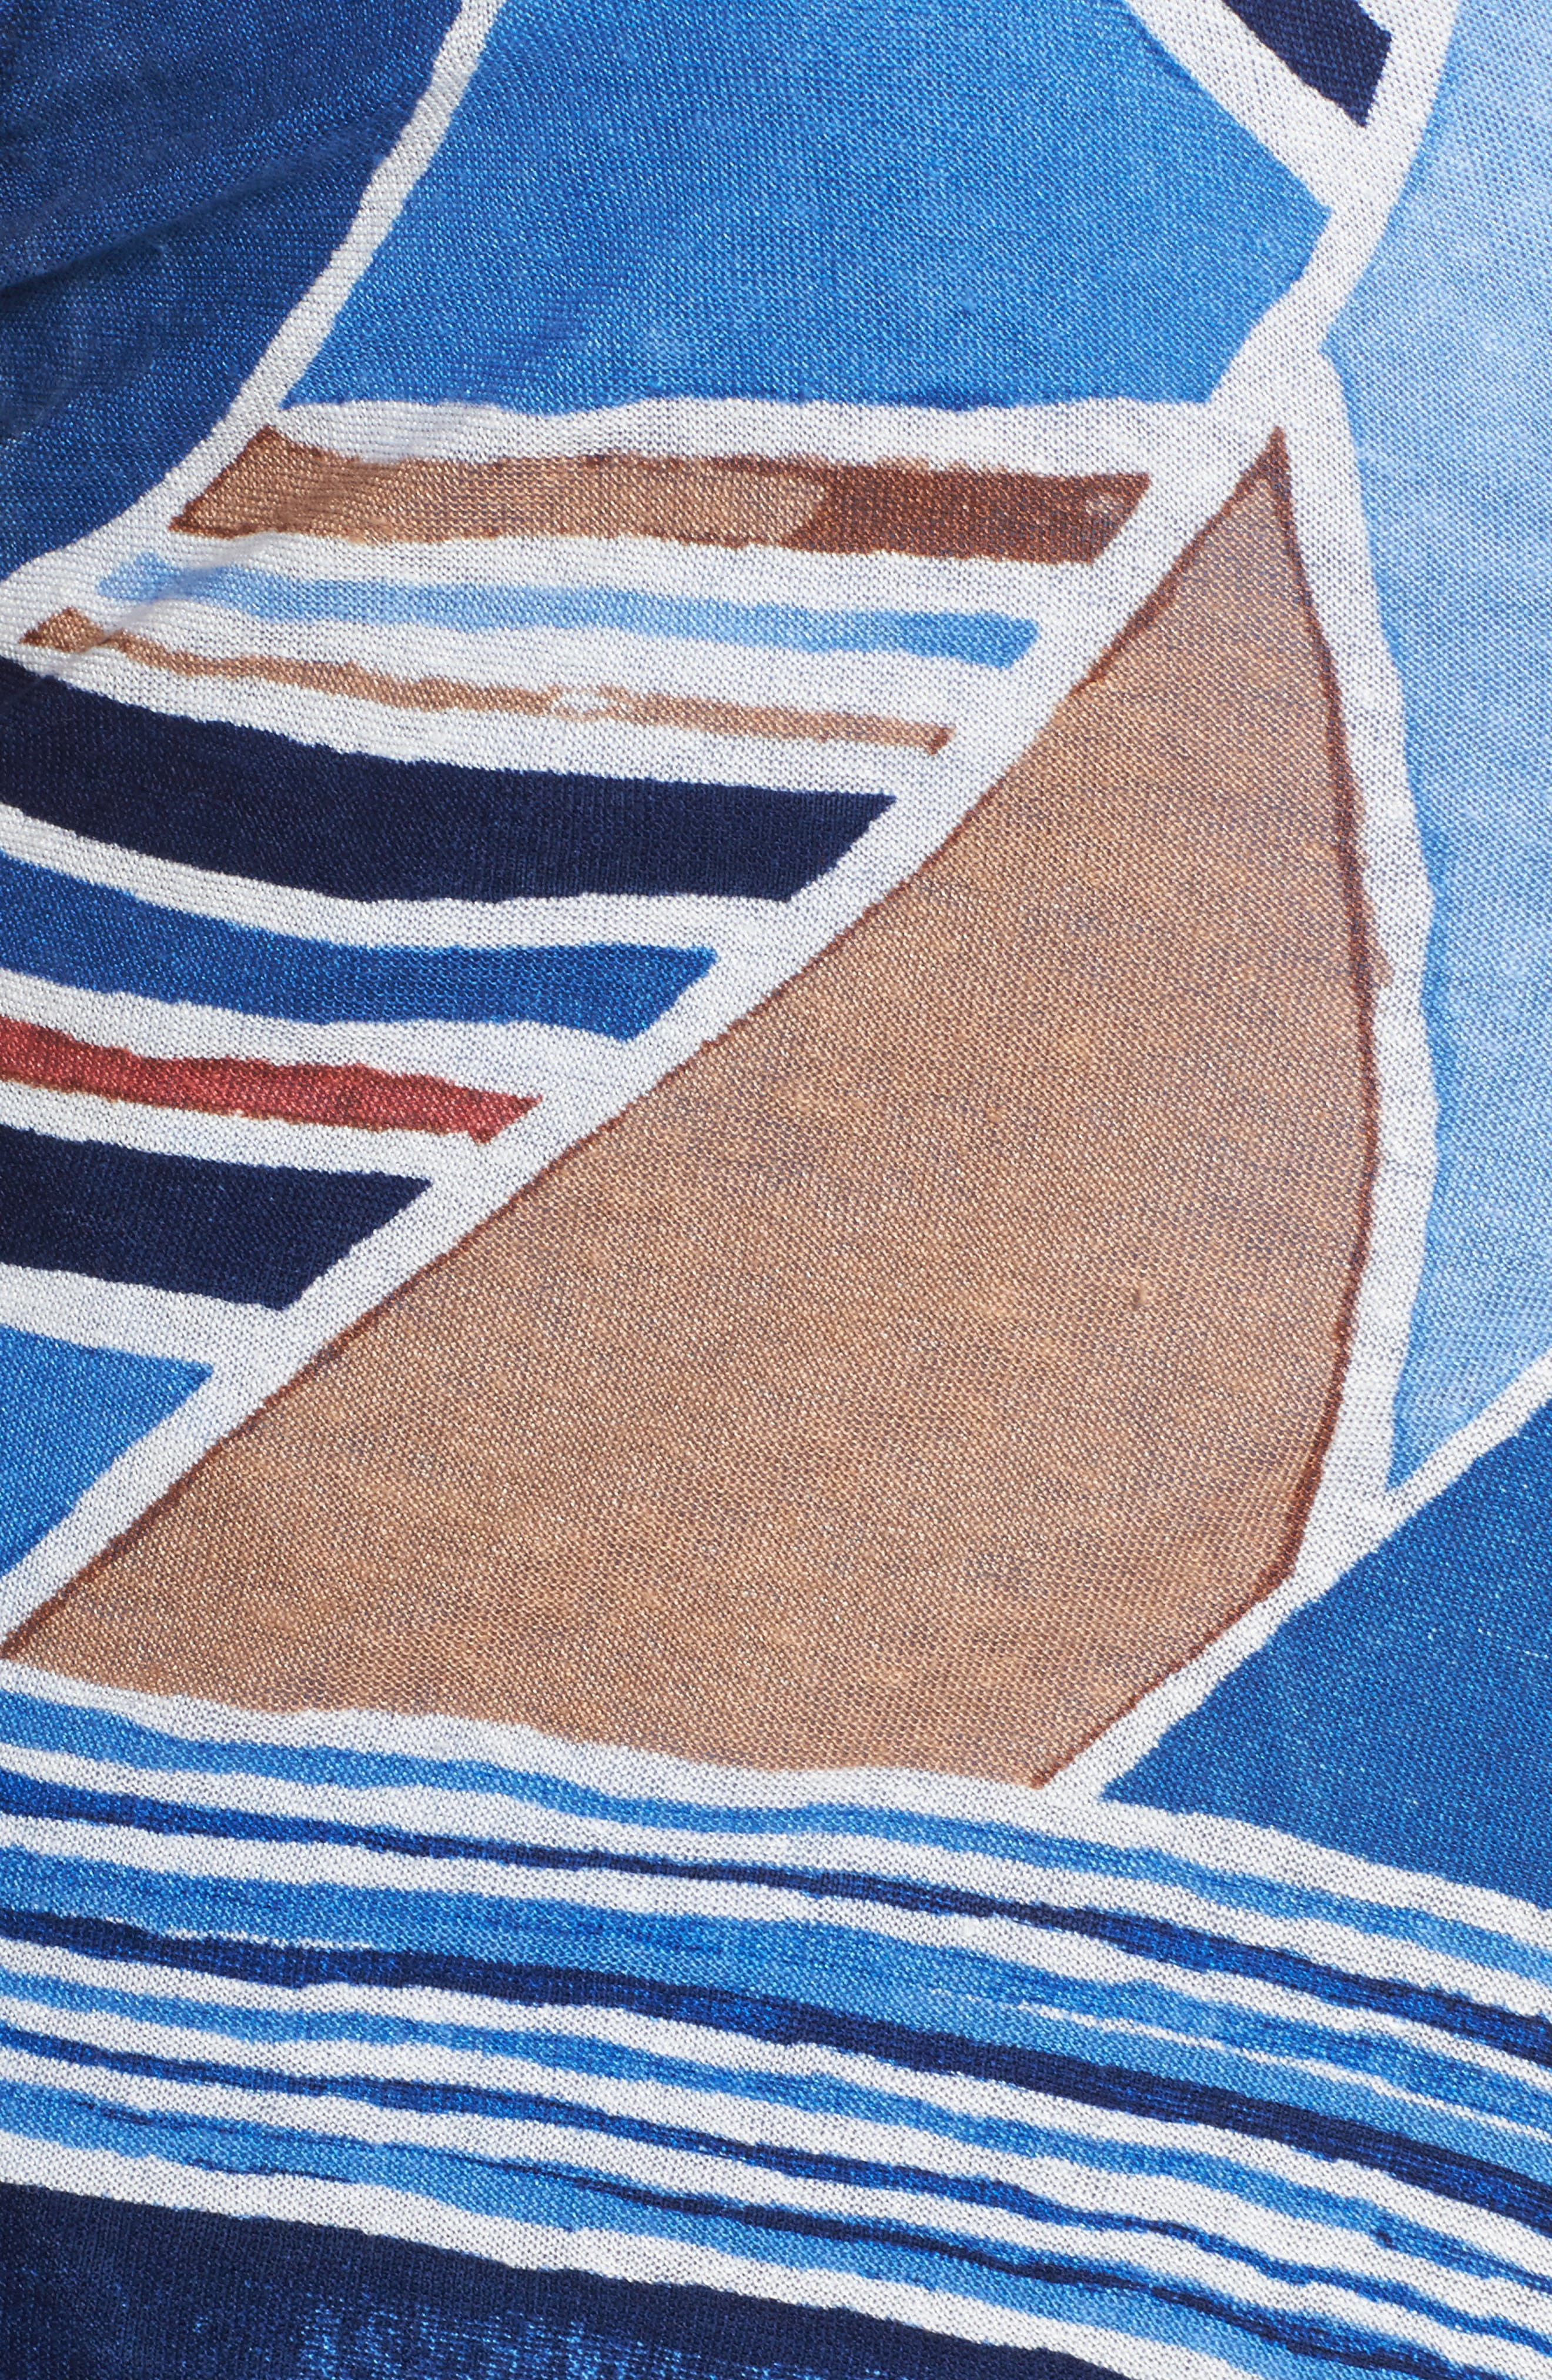 Seaglass Linen Convertible 4-Way Cardigan,                             Alternate thumbnail 5, color,                             MULTI